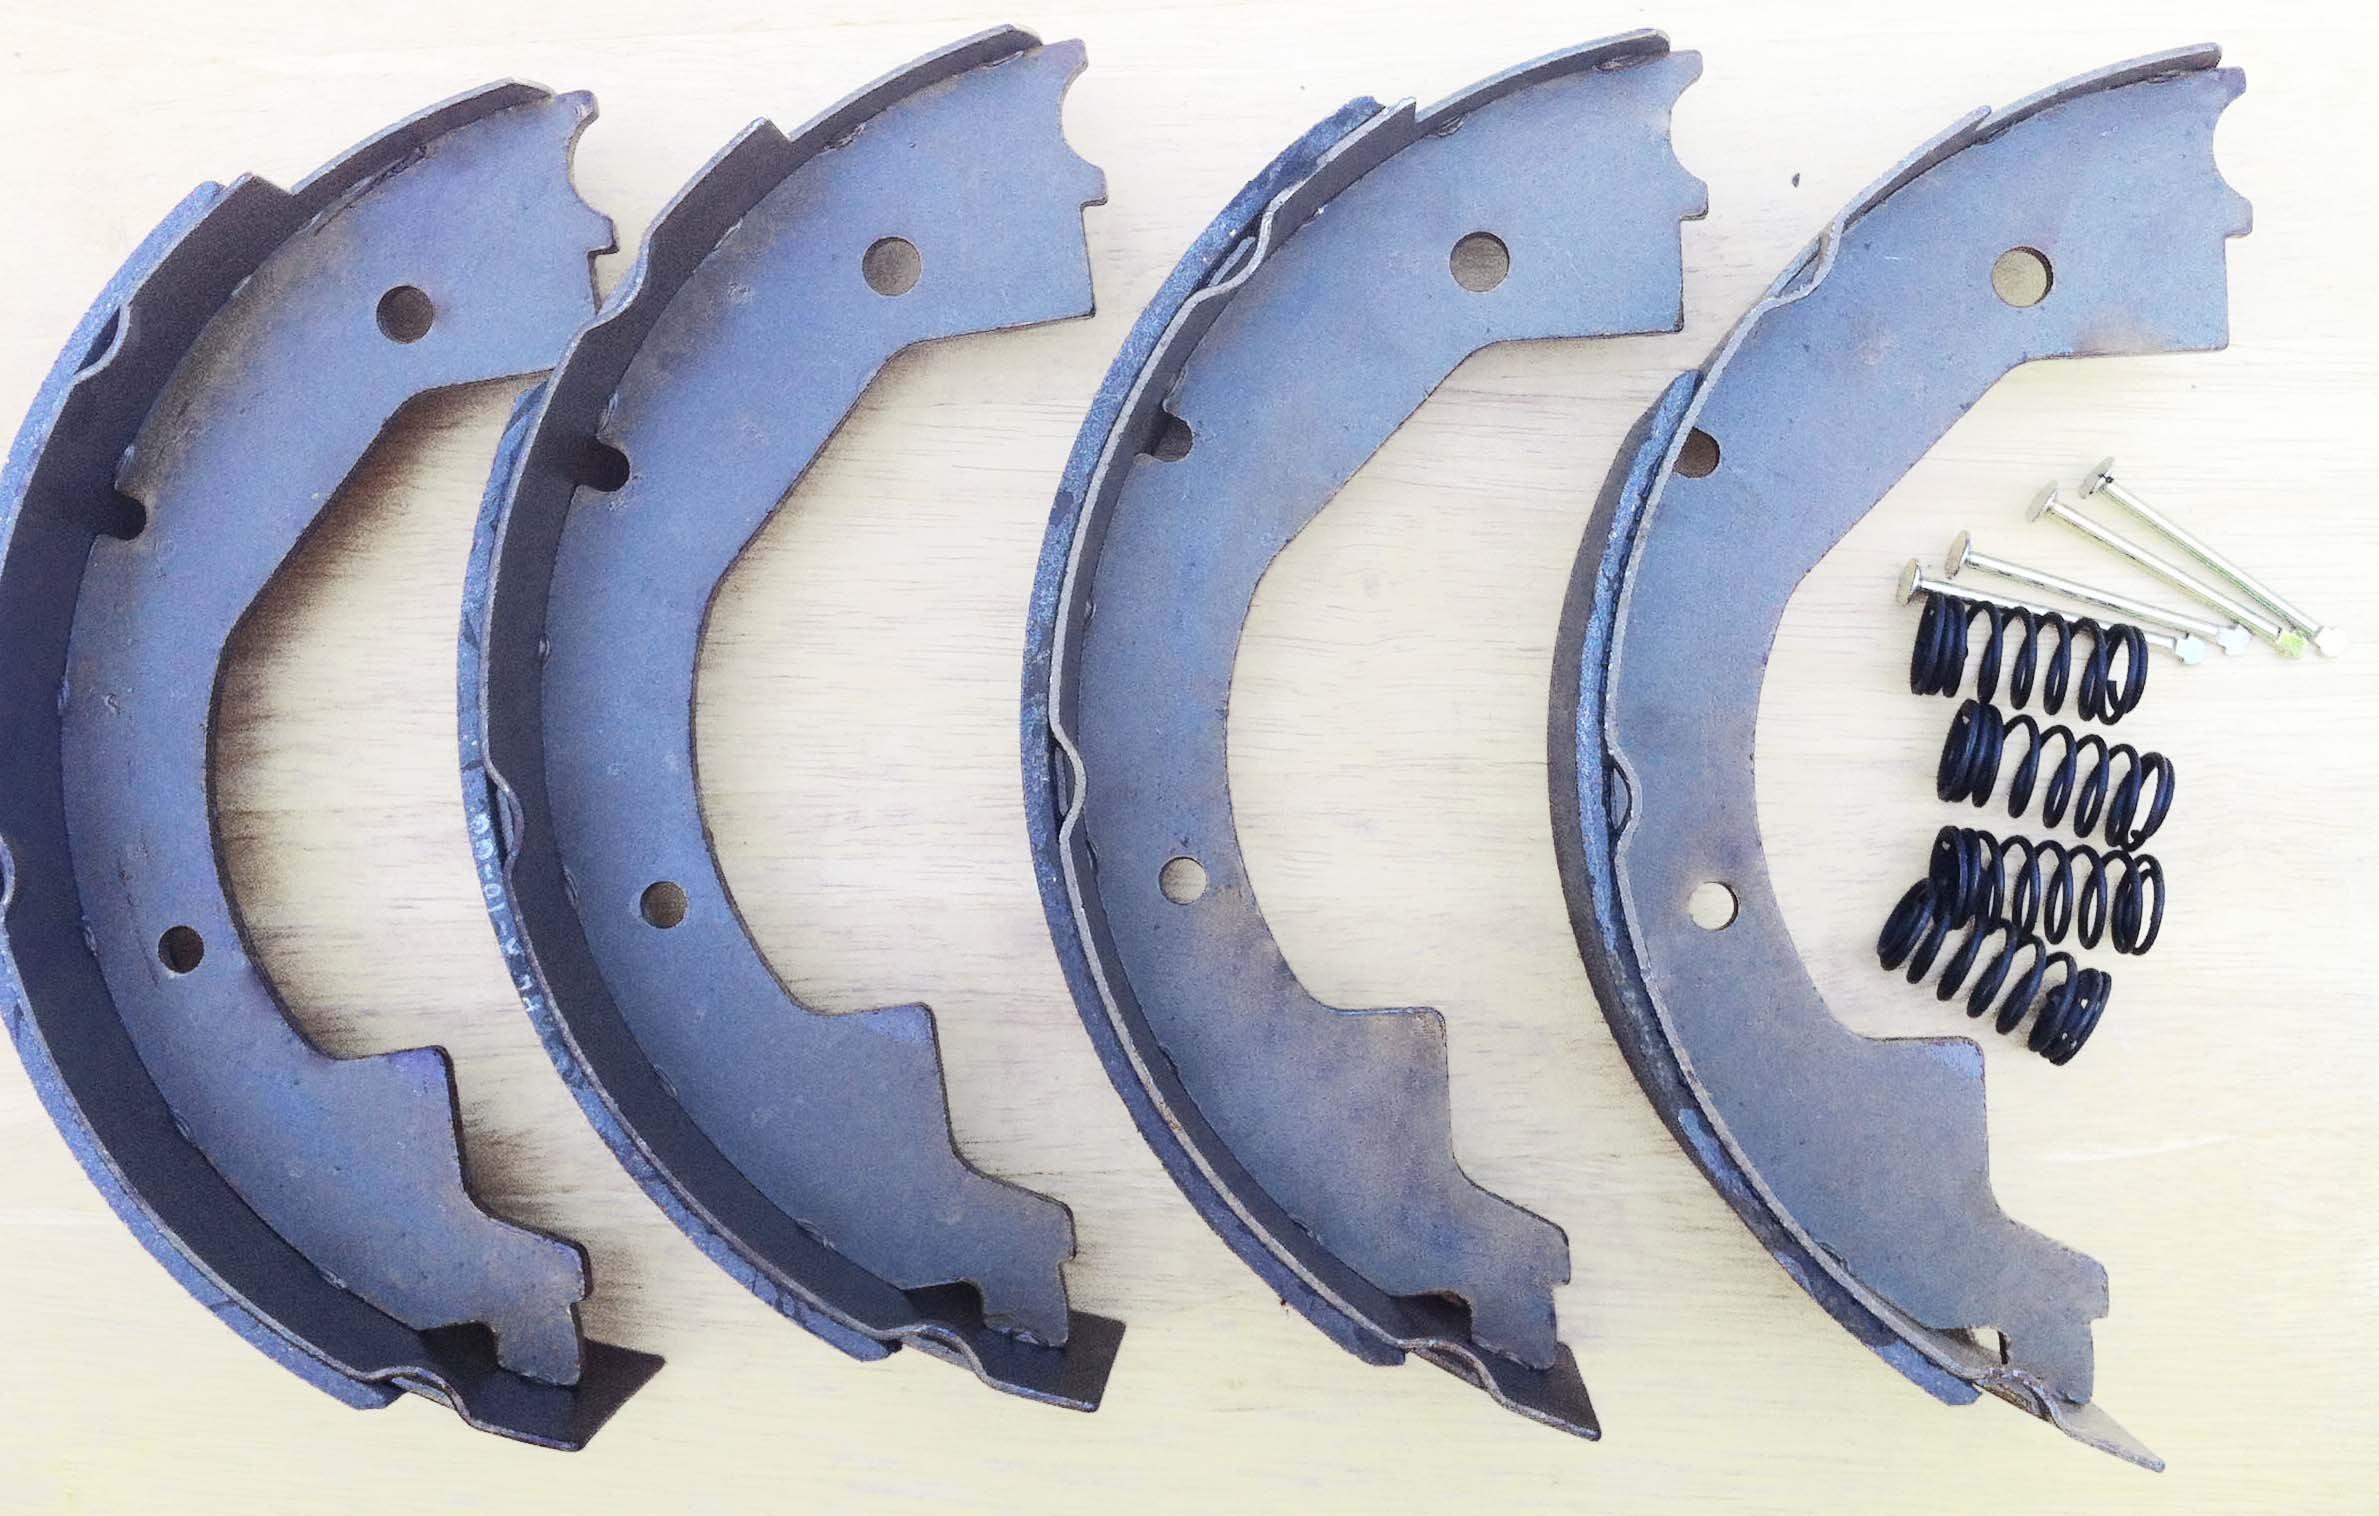 LIBRA 10'' X 2-1/4'' trailer brake shoes replacement kits (2 pairs) - 21028/21042